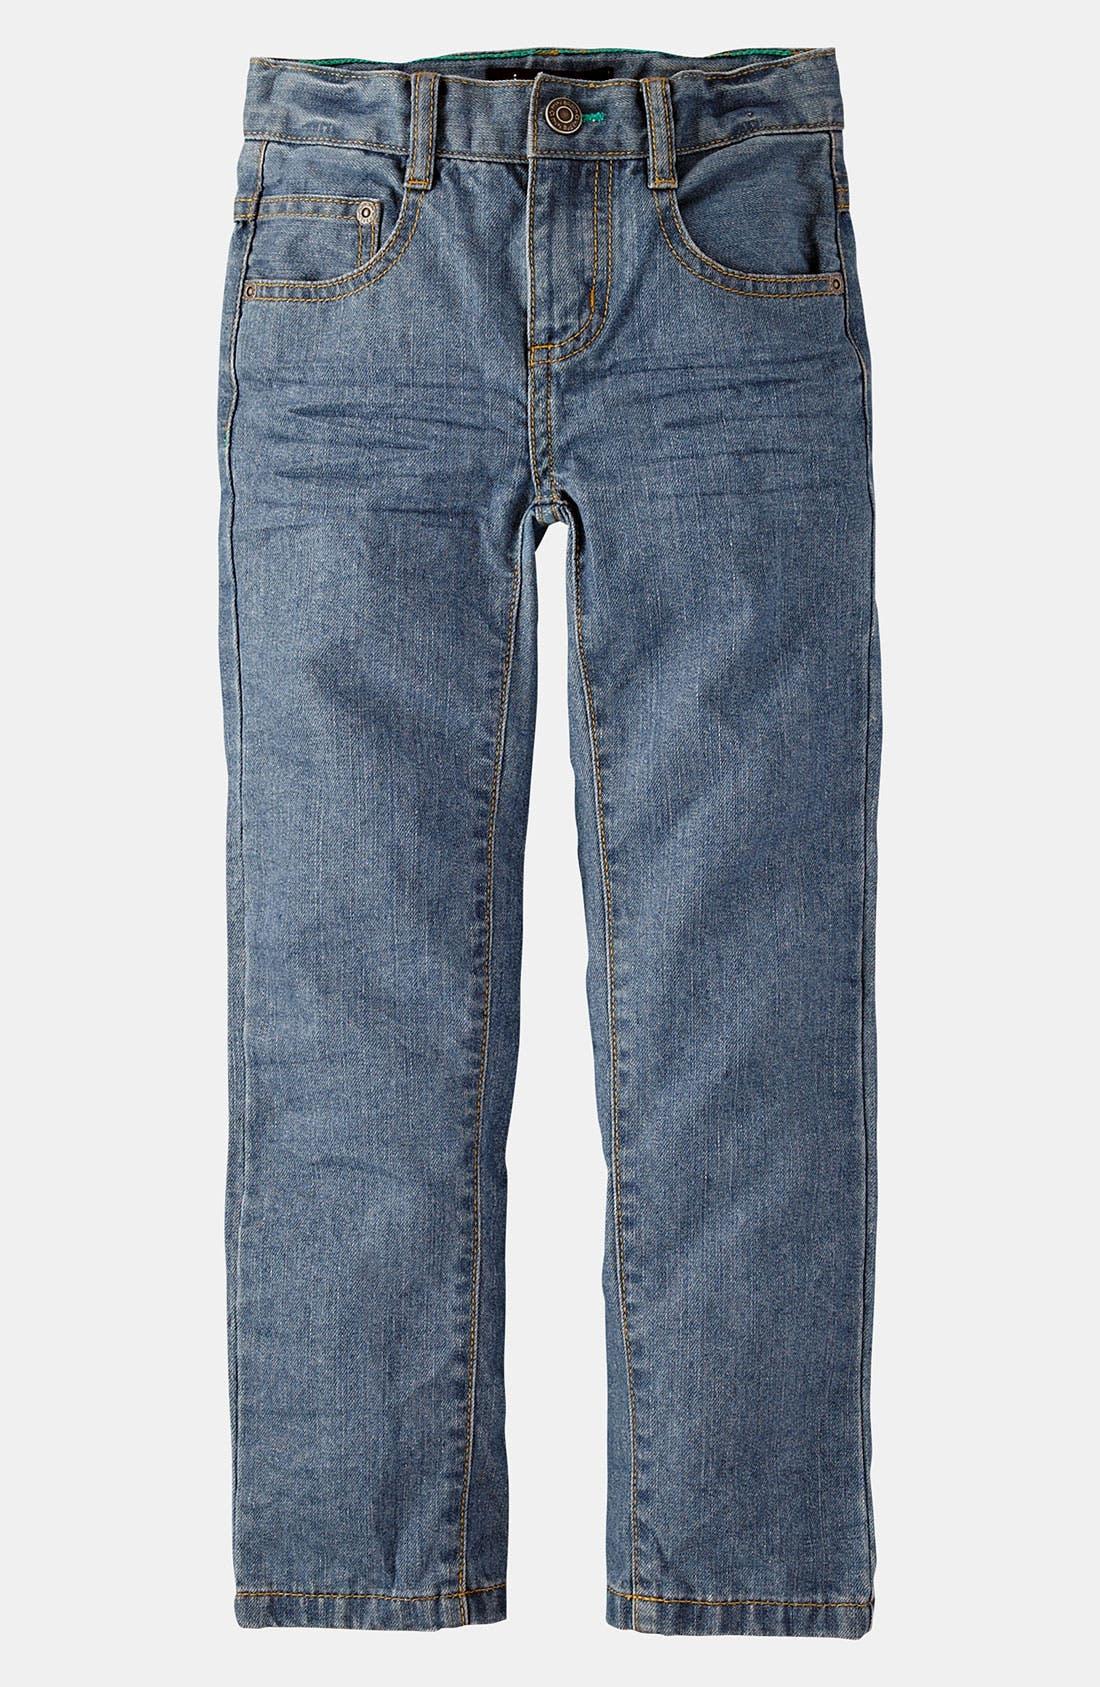 Alternate Image 1 Selected - Mini Boden Slim Fit Jeans (Little Boys & Big Boys)